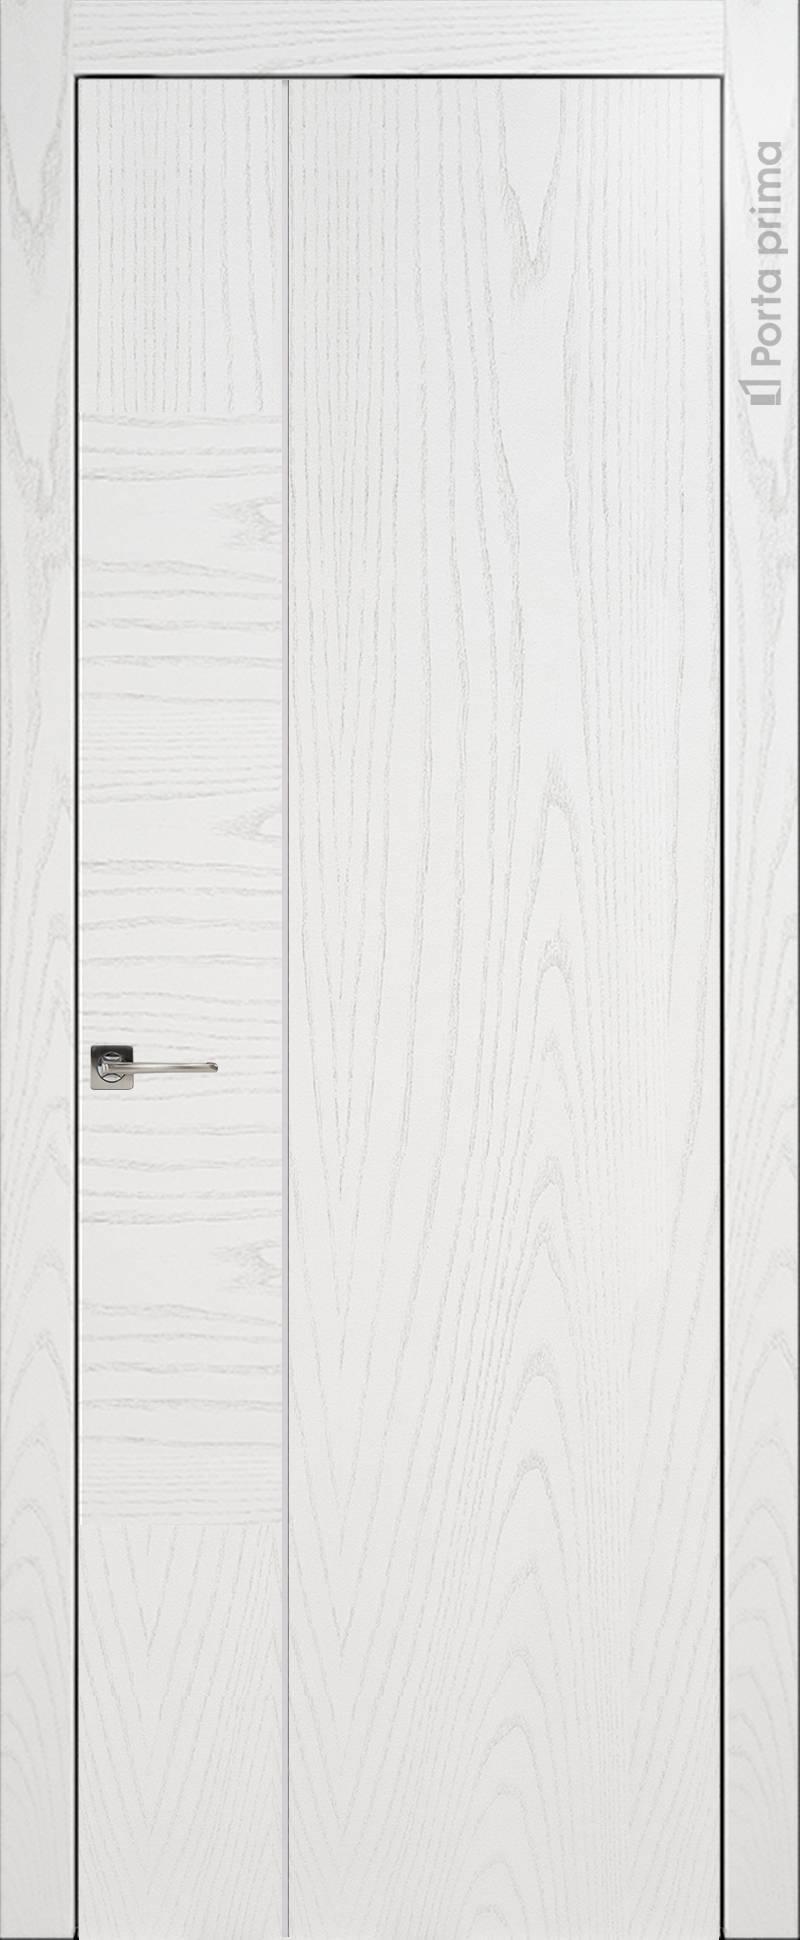 Tivoli В-1 цвет - Белый ясень (шпон) Без стекла (ДГ)